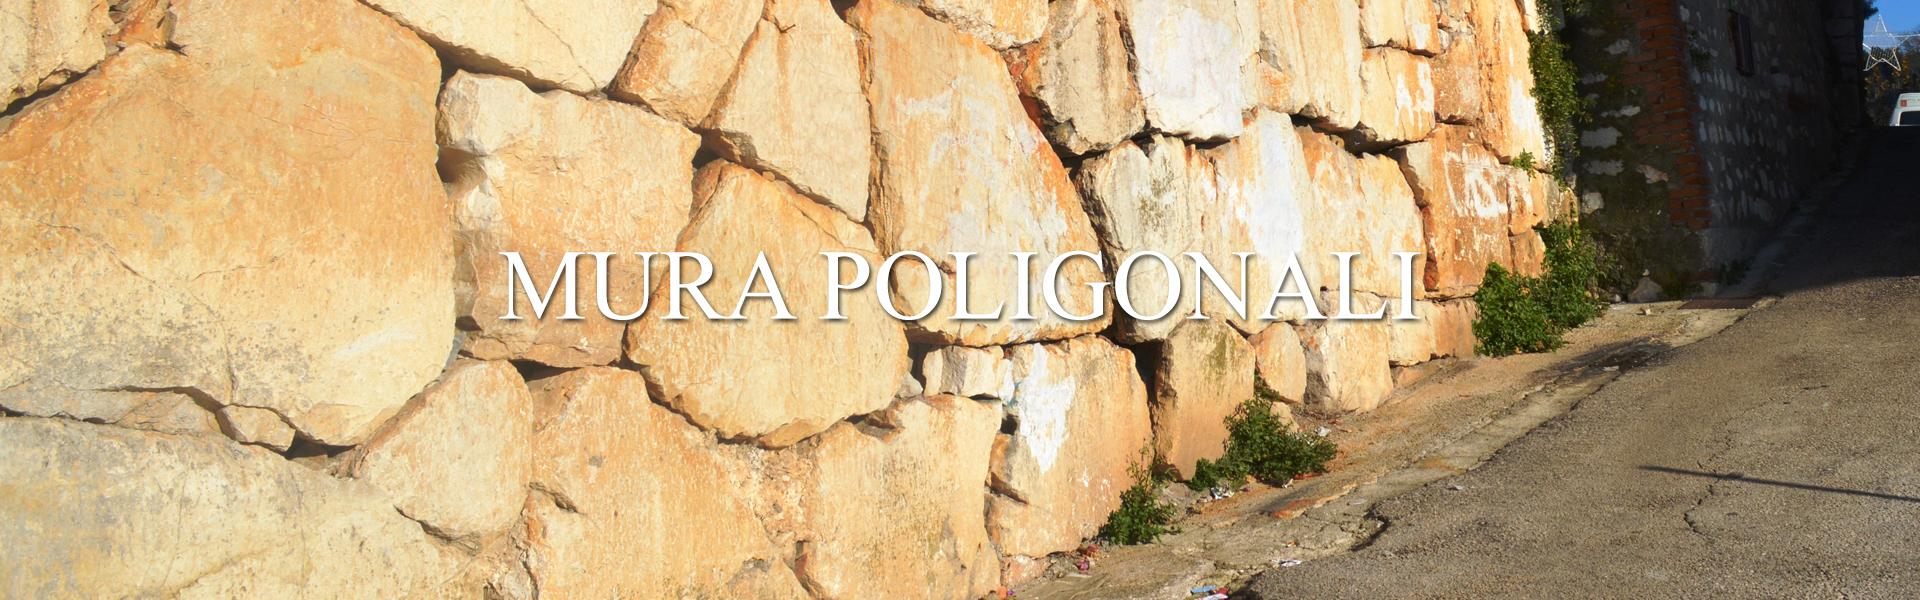 sezze-cultura-mura-poligonali-cop-1920x600